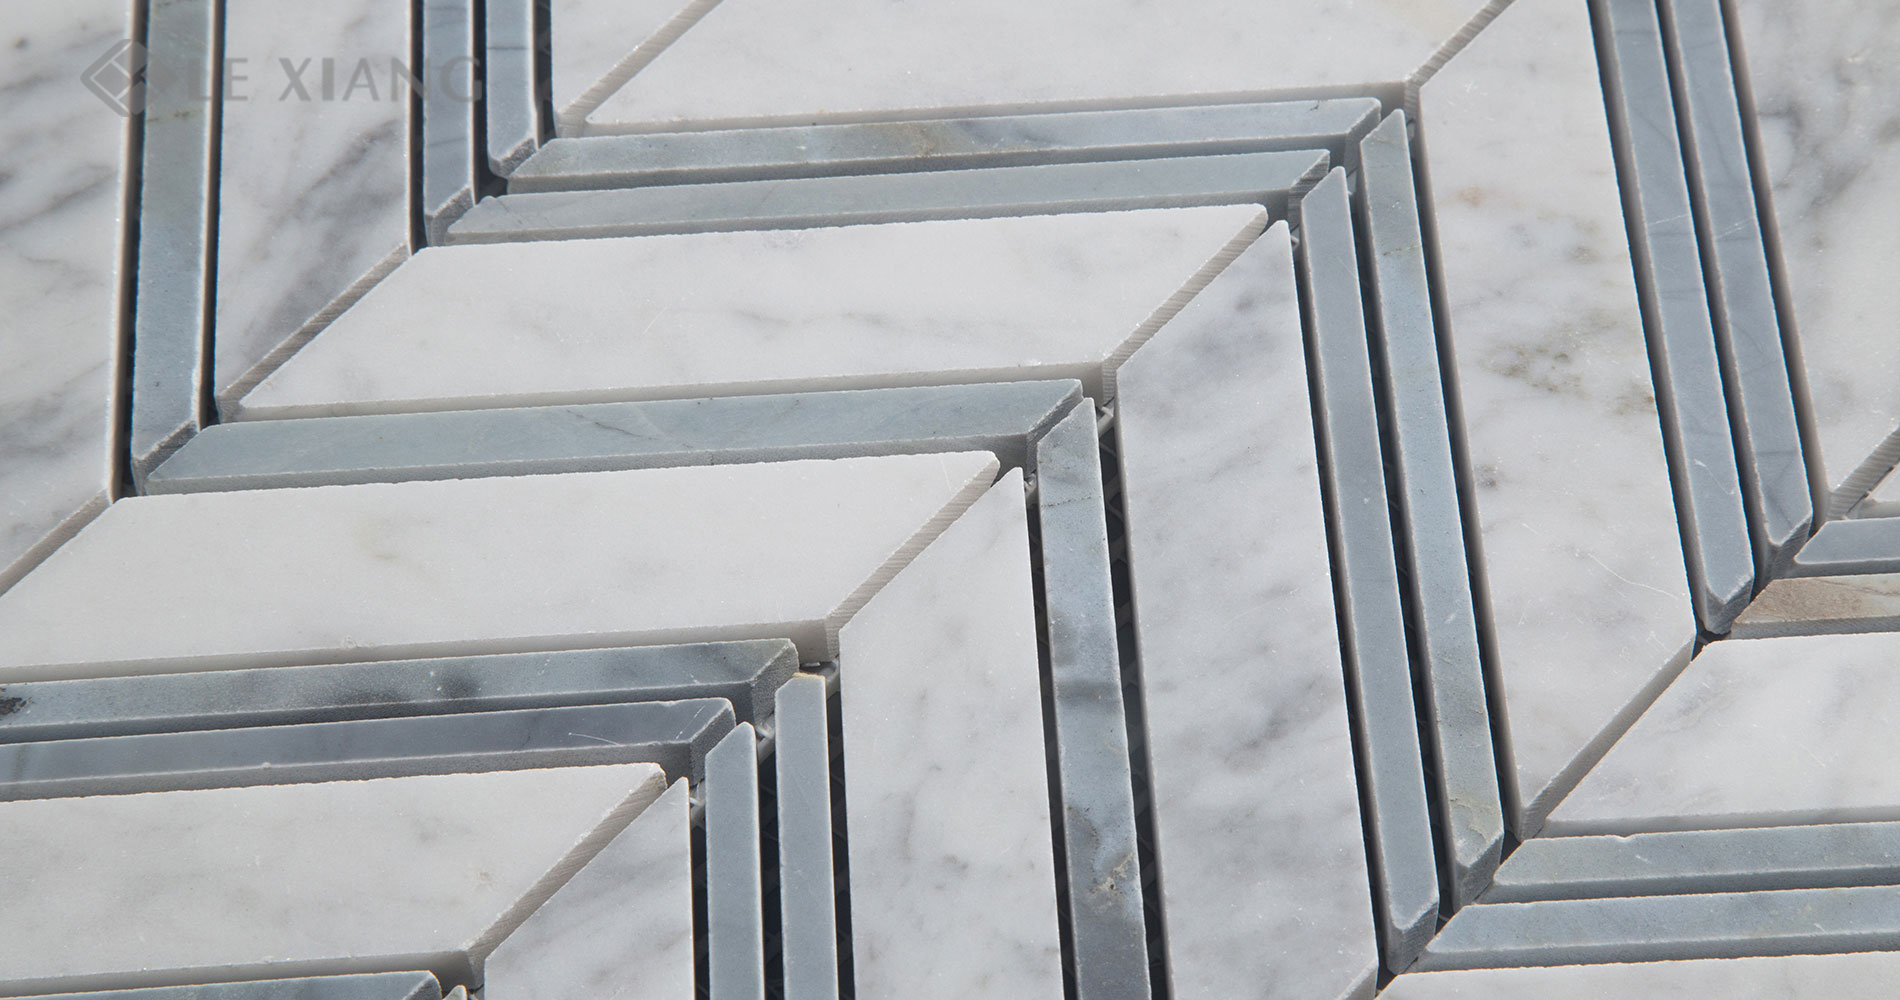 Chevron-Pattern-Marble-Mosaic-Tile-Bothroom-Floors-Kitchen-Backsplash-1-4